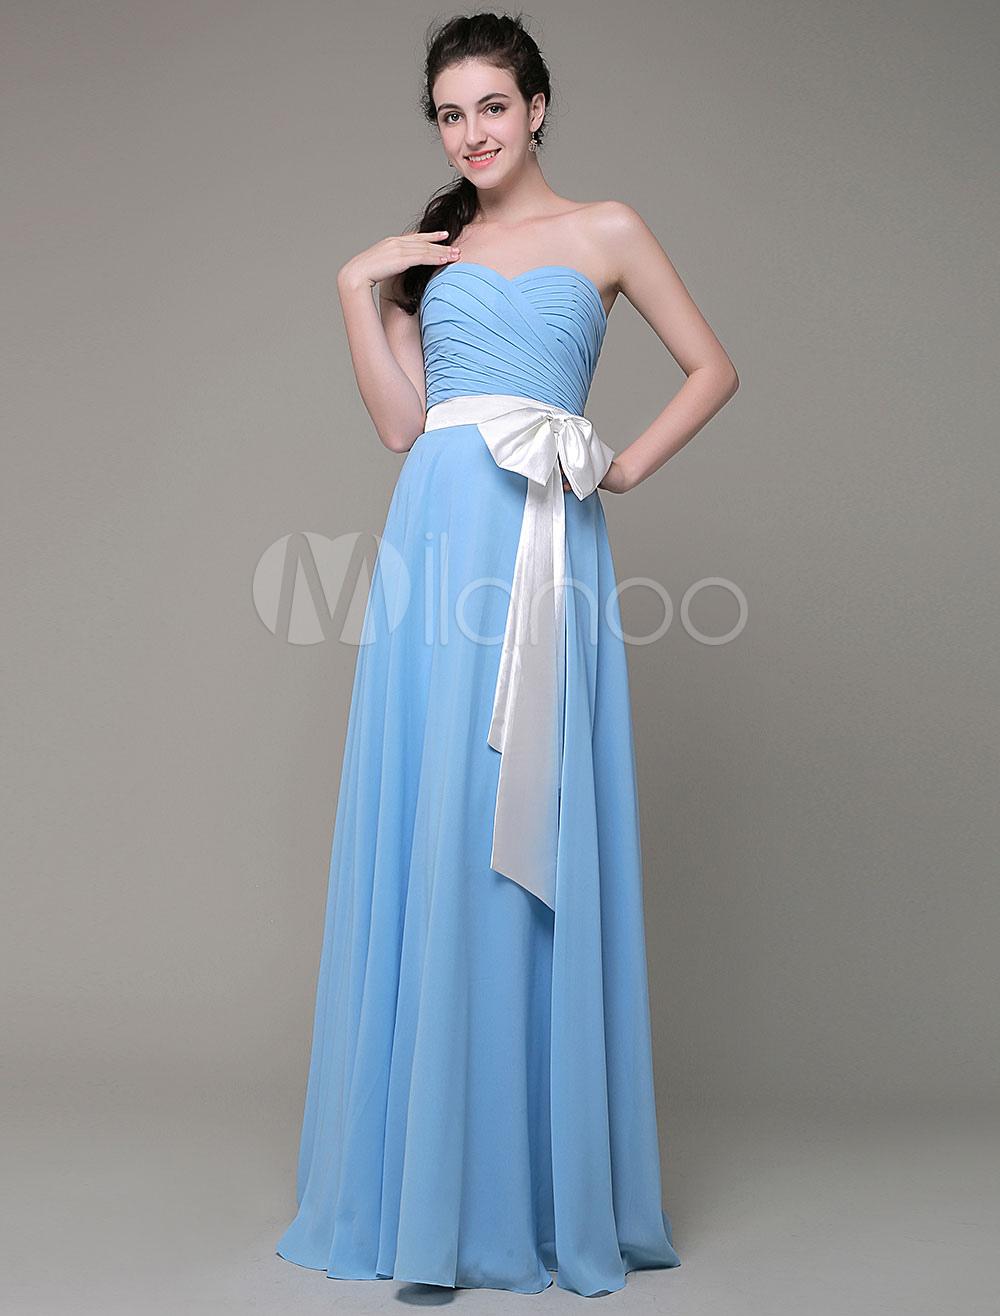 Sweatheart Bridesmaid Dress A-Line Chiffon Pleated Floor Length With Sash Bow Milanoo